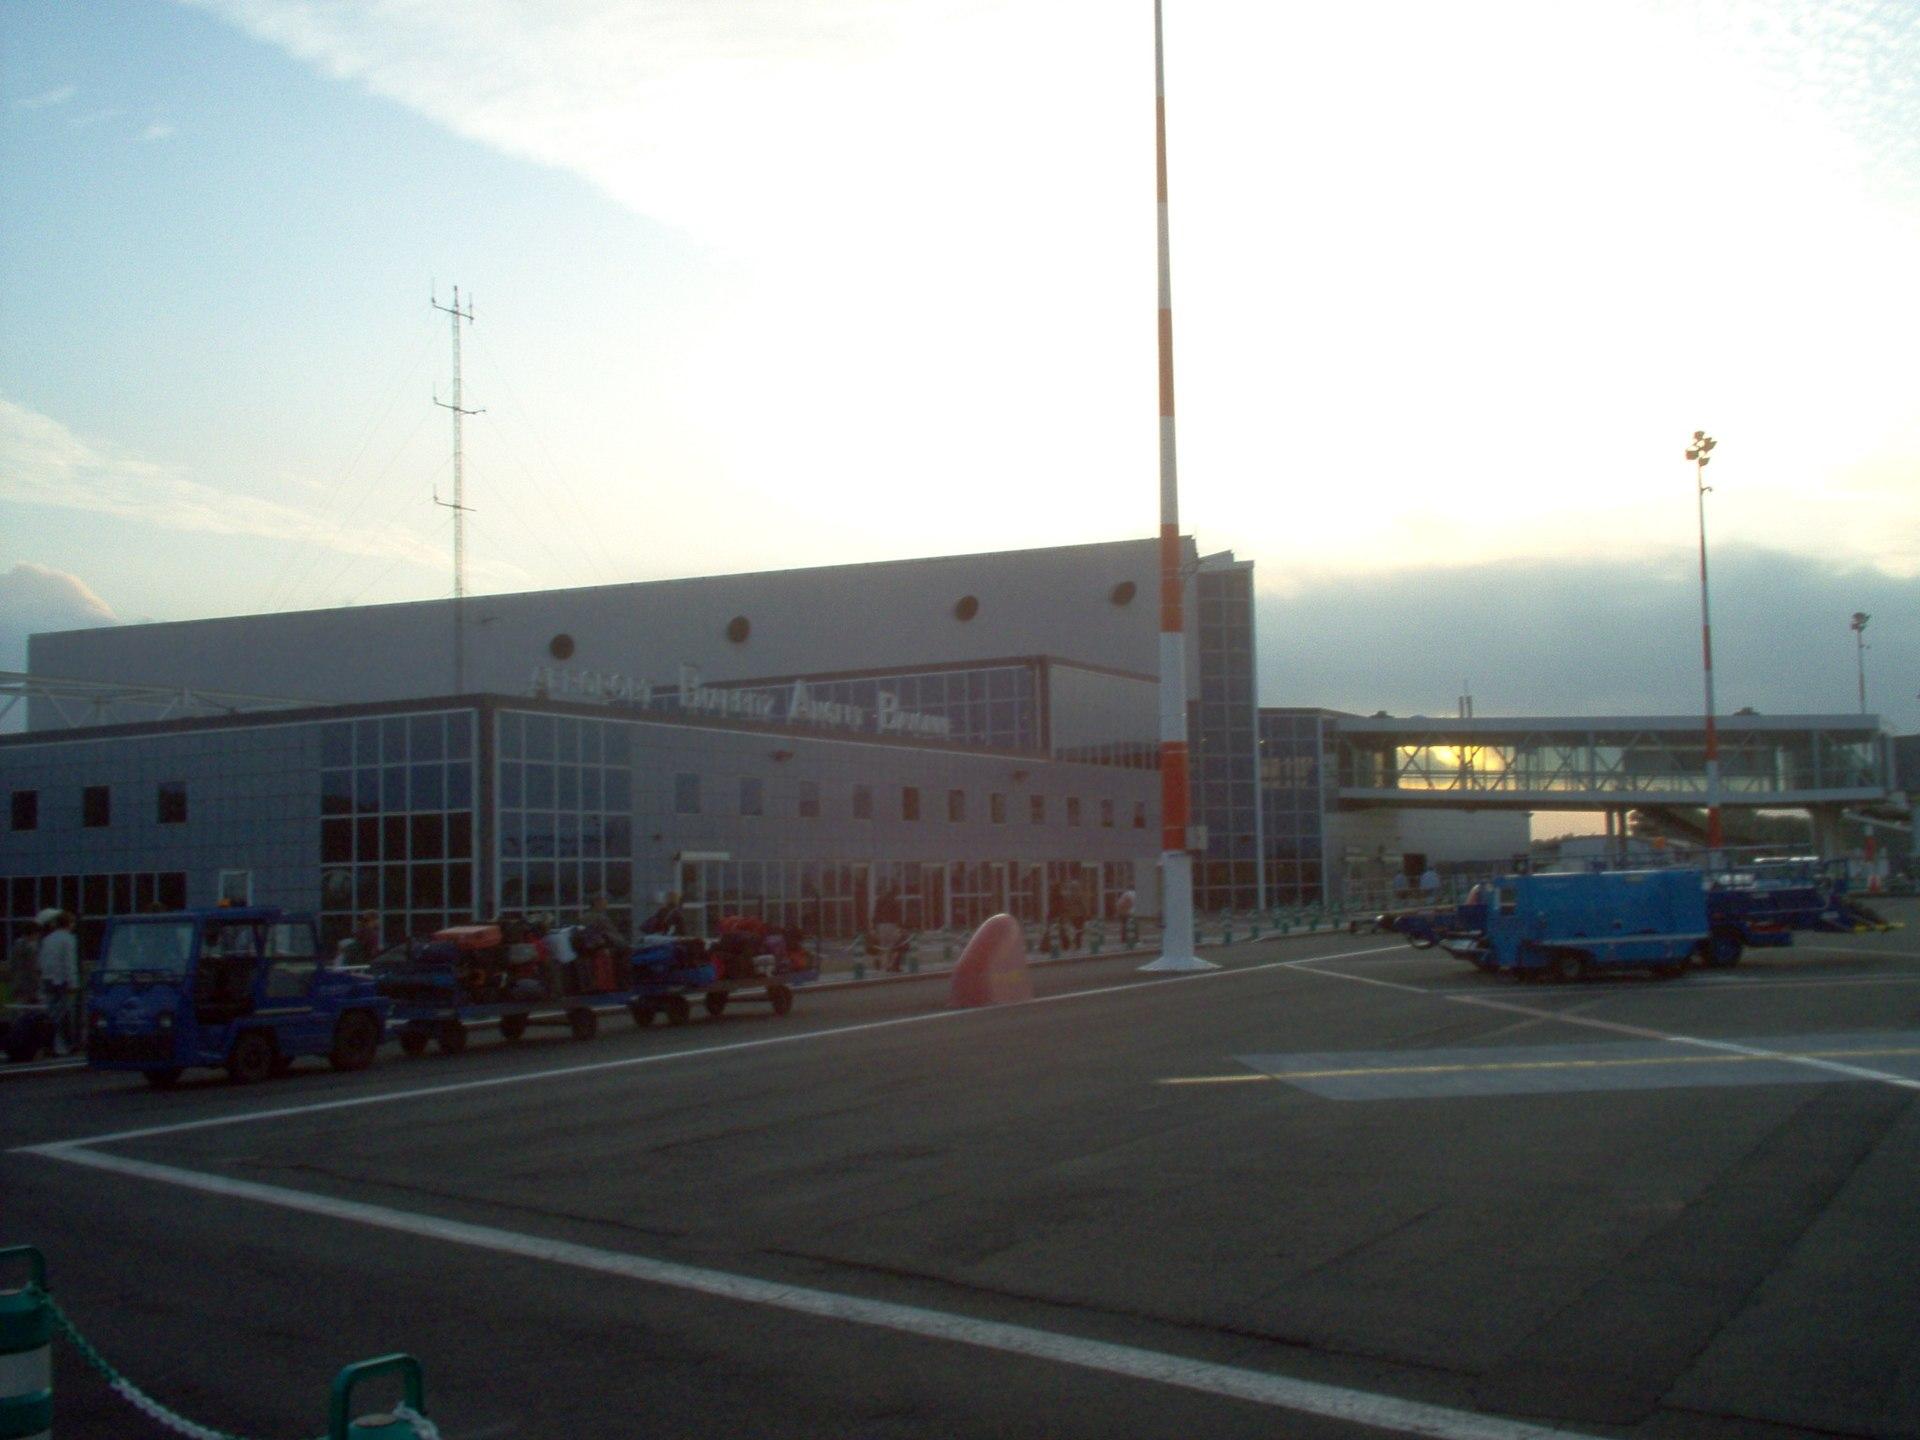 Biarritz Pays Basque Airport - Wikipedia